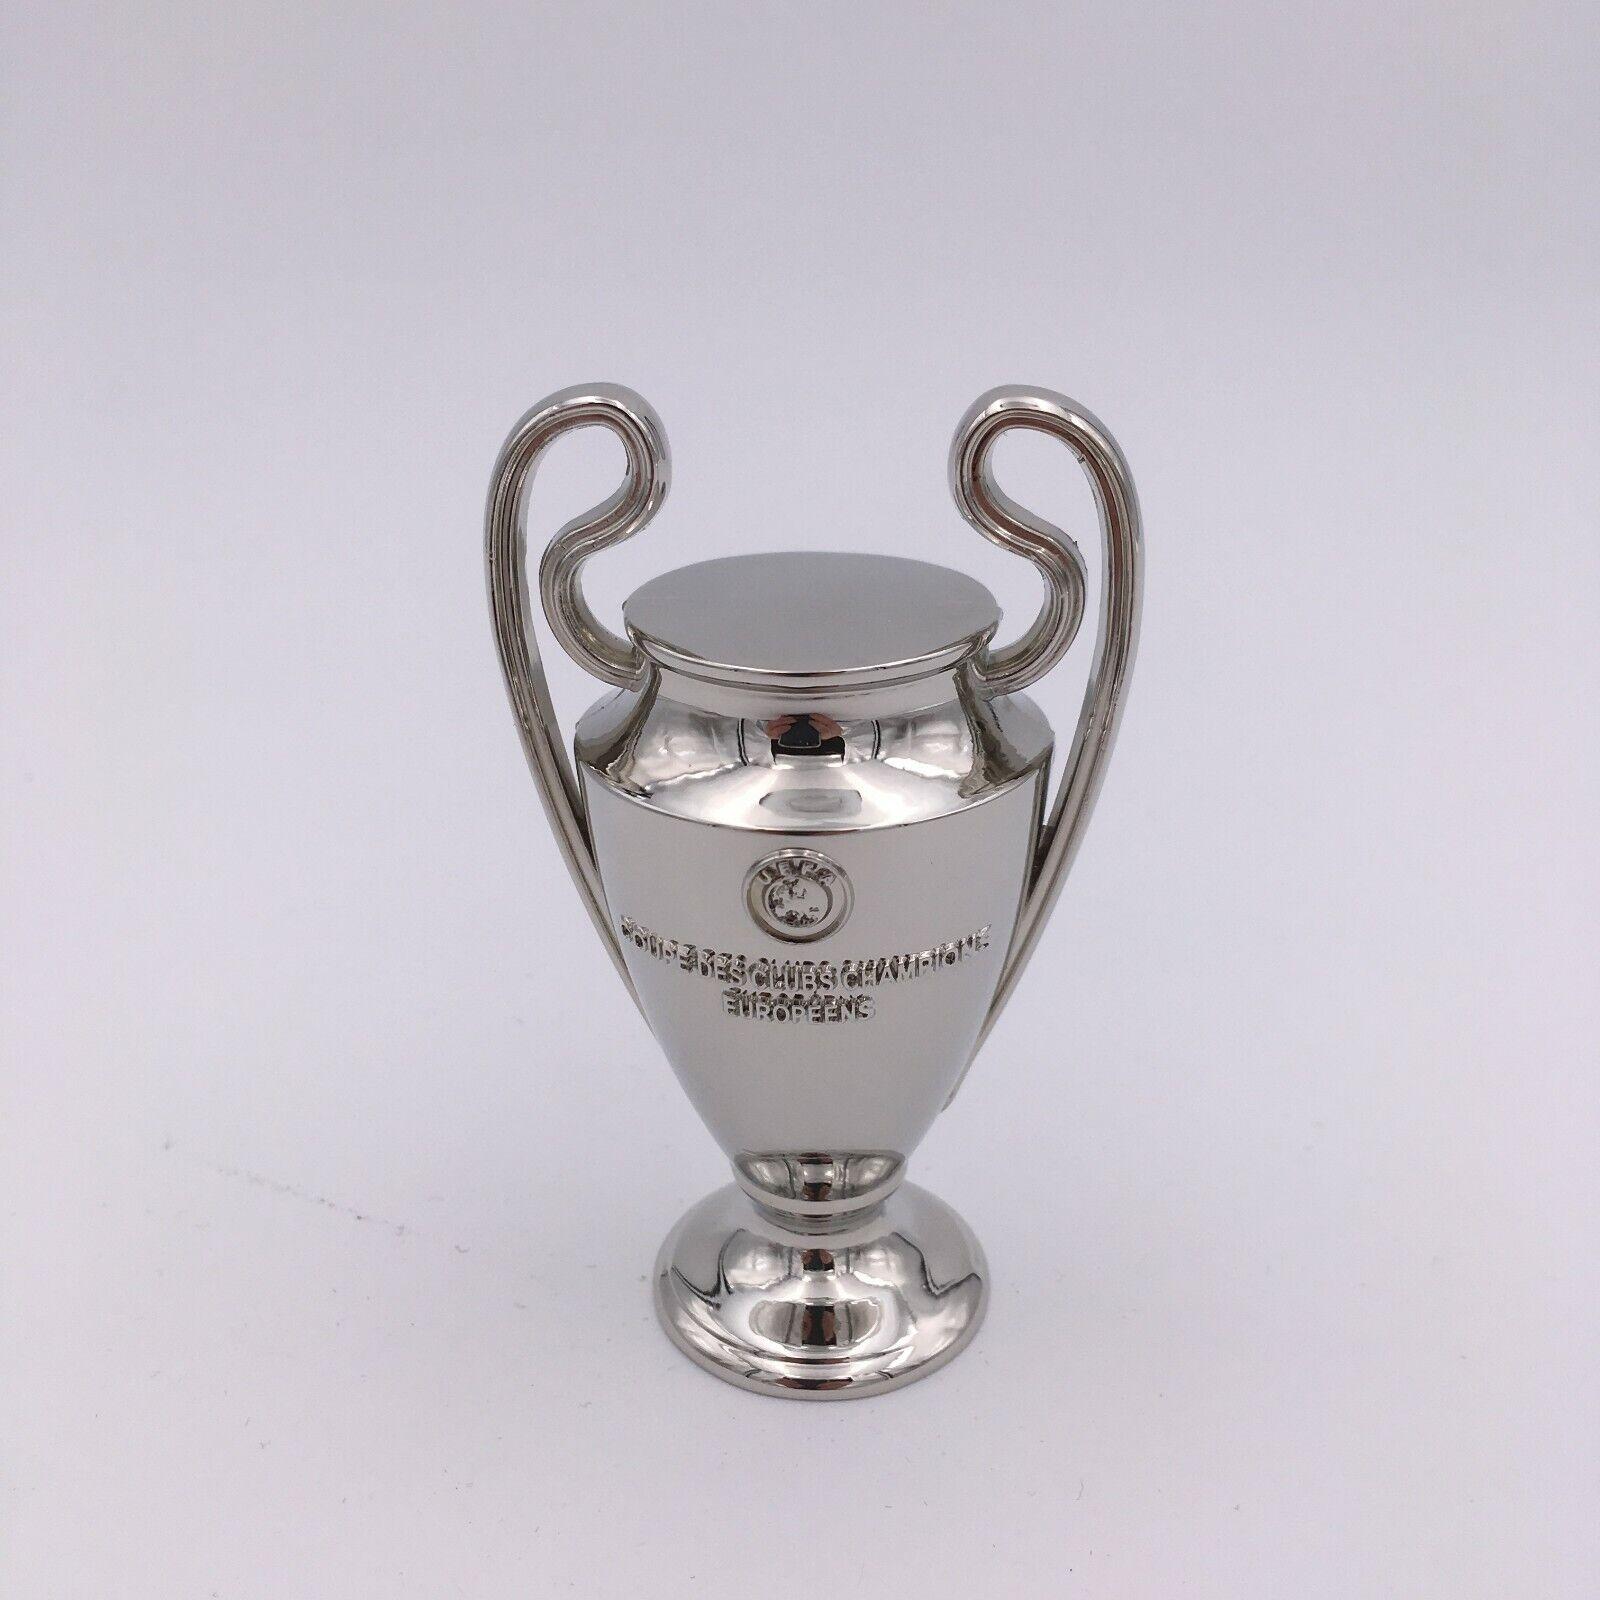 League Champions Technologie Replica Uefa Pokal GrüneMetall Neue F1KlcTJ